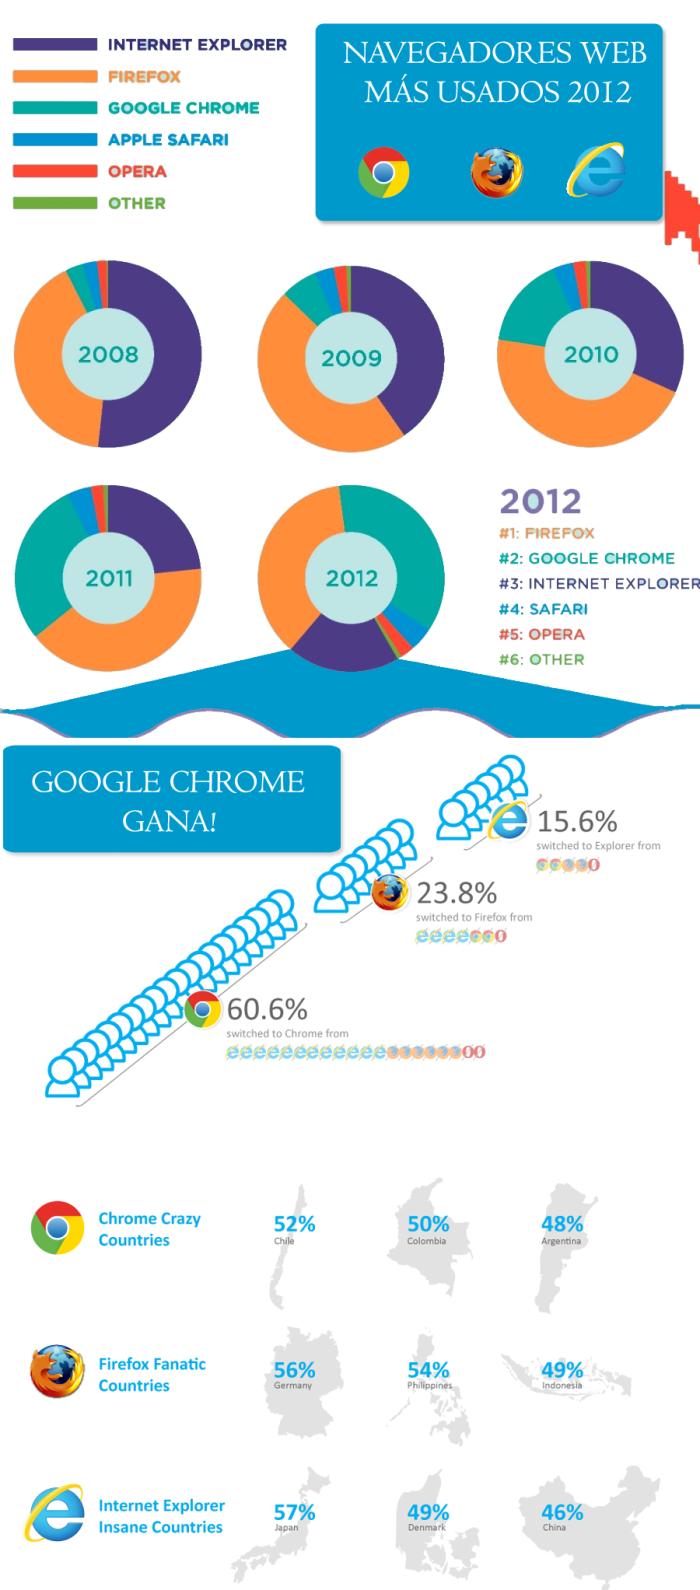 Navegadores Web mas Usados 2012